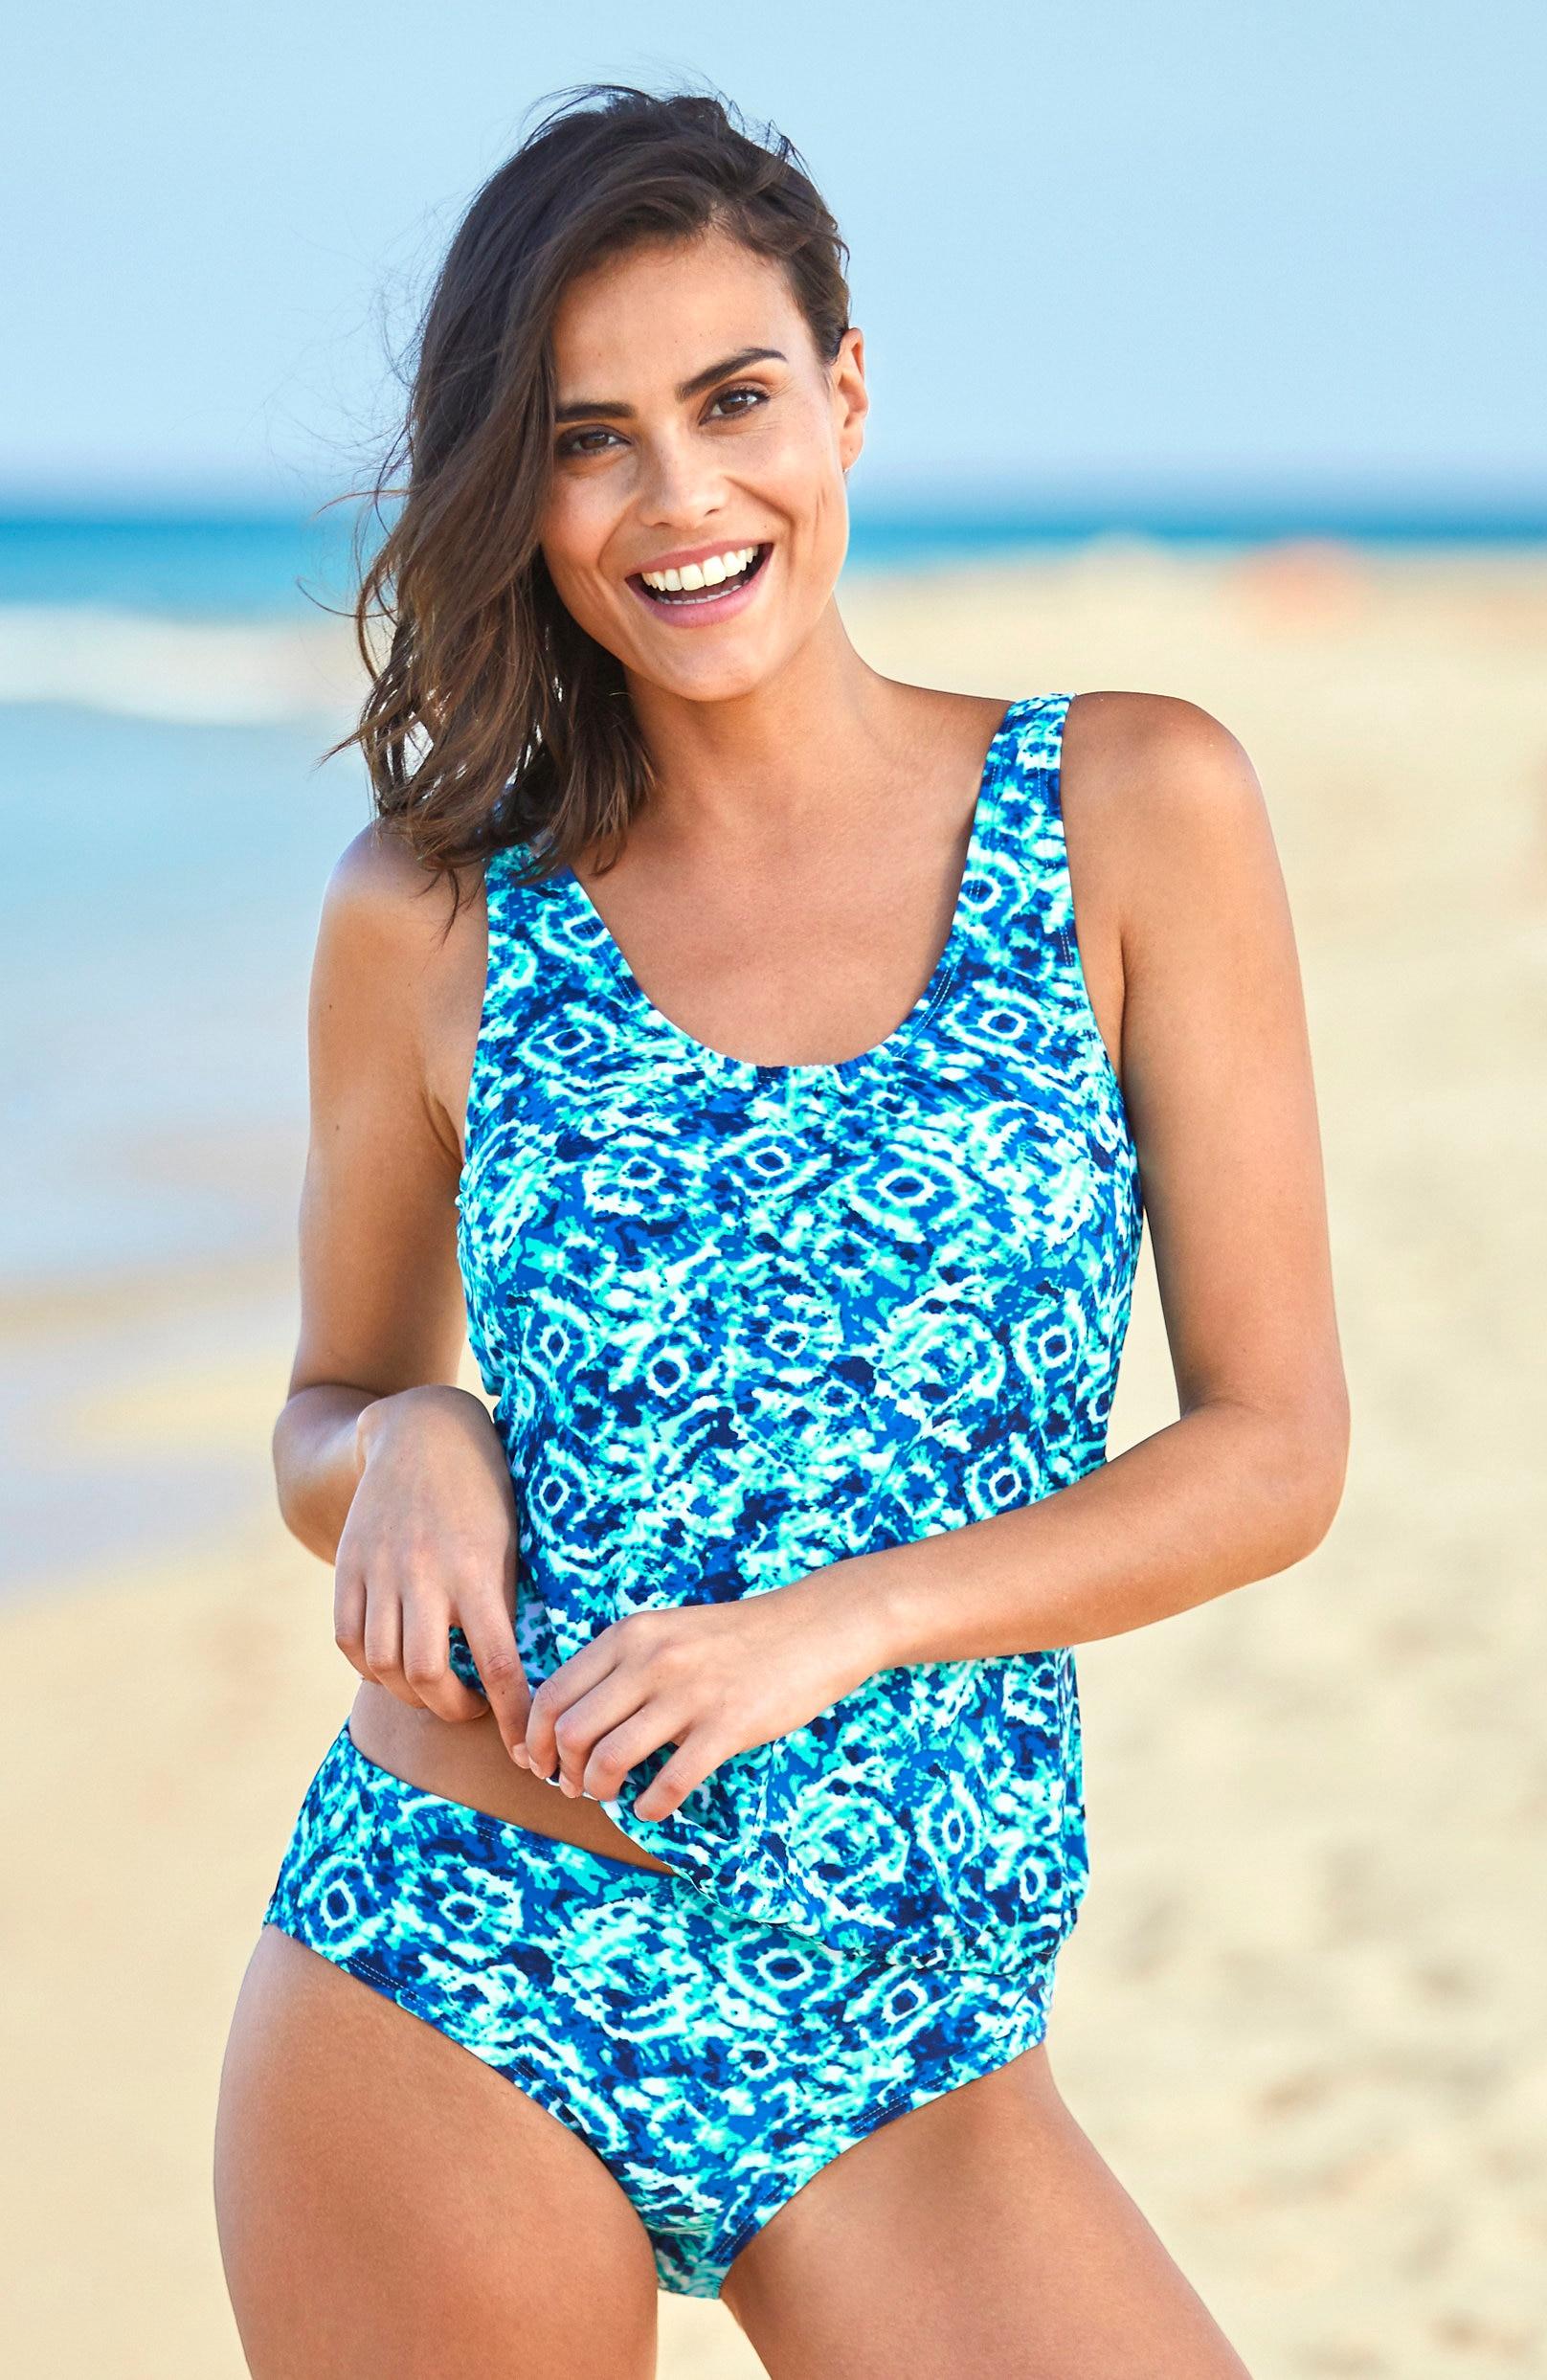 Blåmønstret bikinitruse